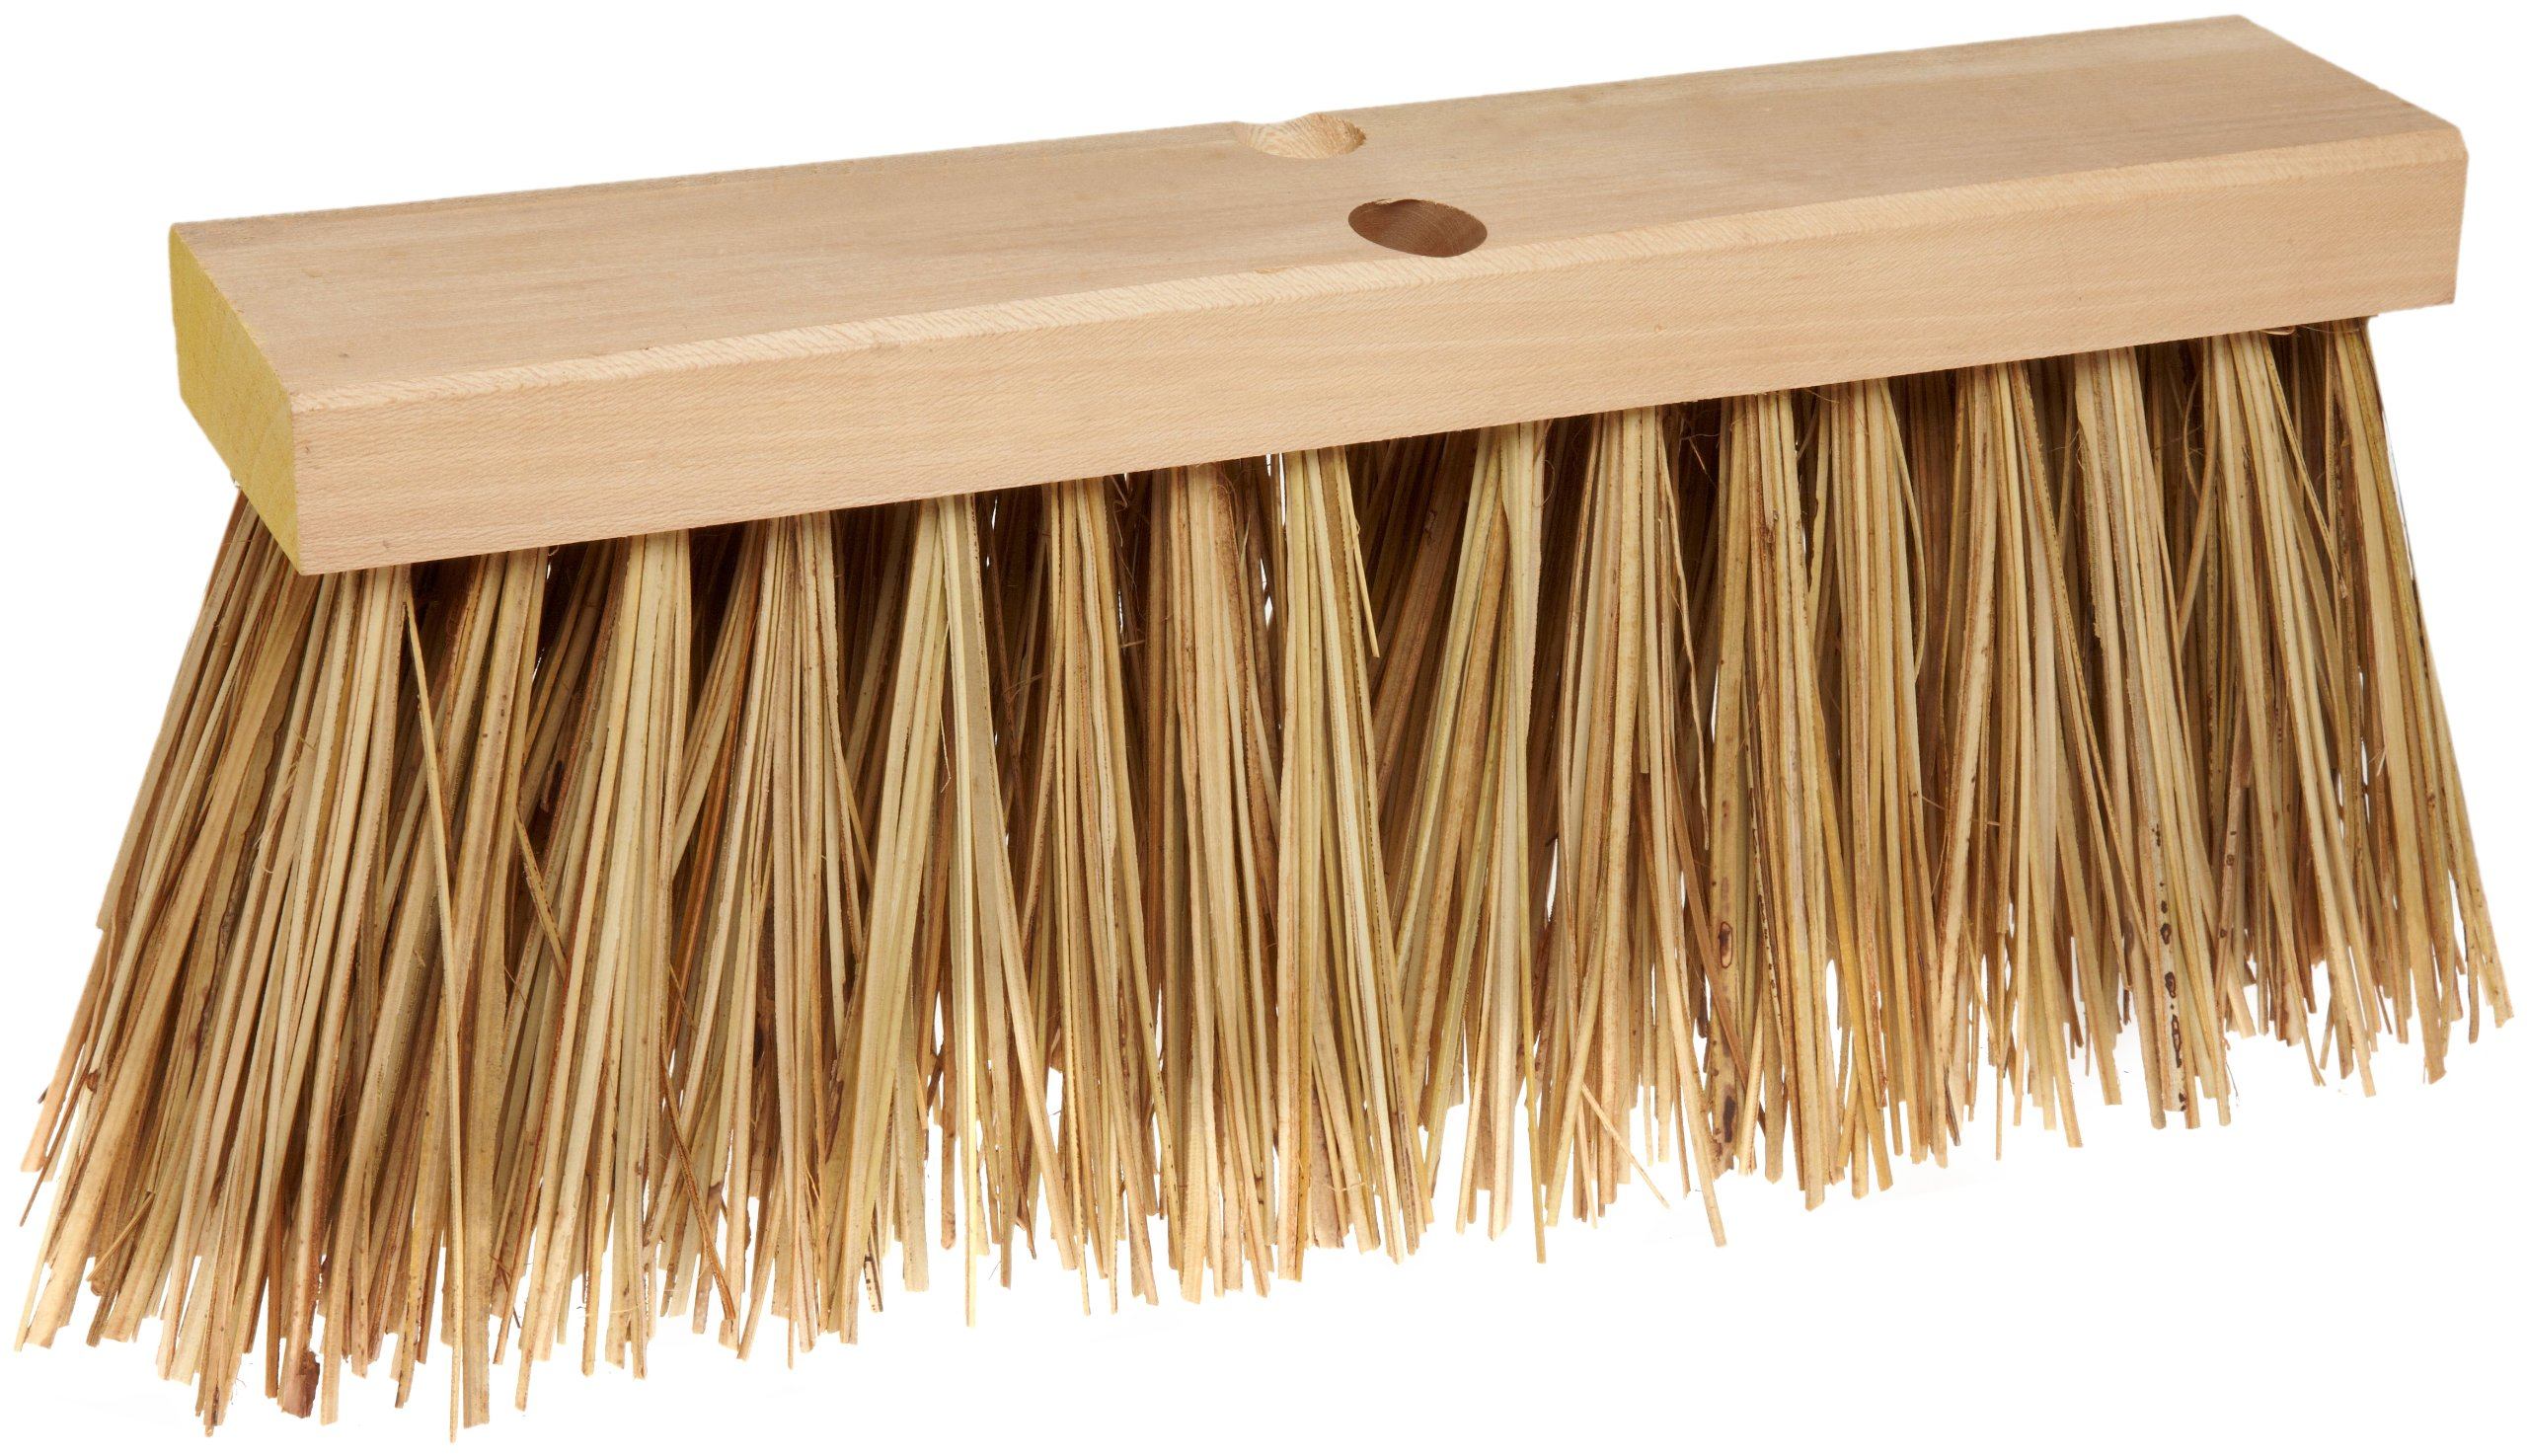 Weiler 70208 Palmyra Fiber Street Broom with Wood Block, Natural Fill, 2-1/2'' Head Width, 16'' Overall Length, Natural